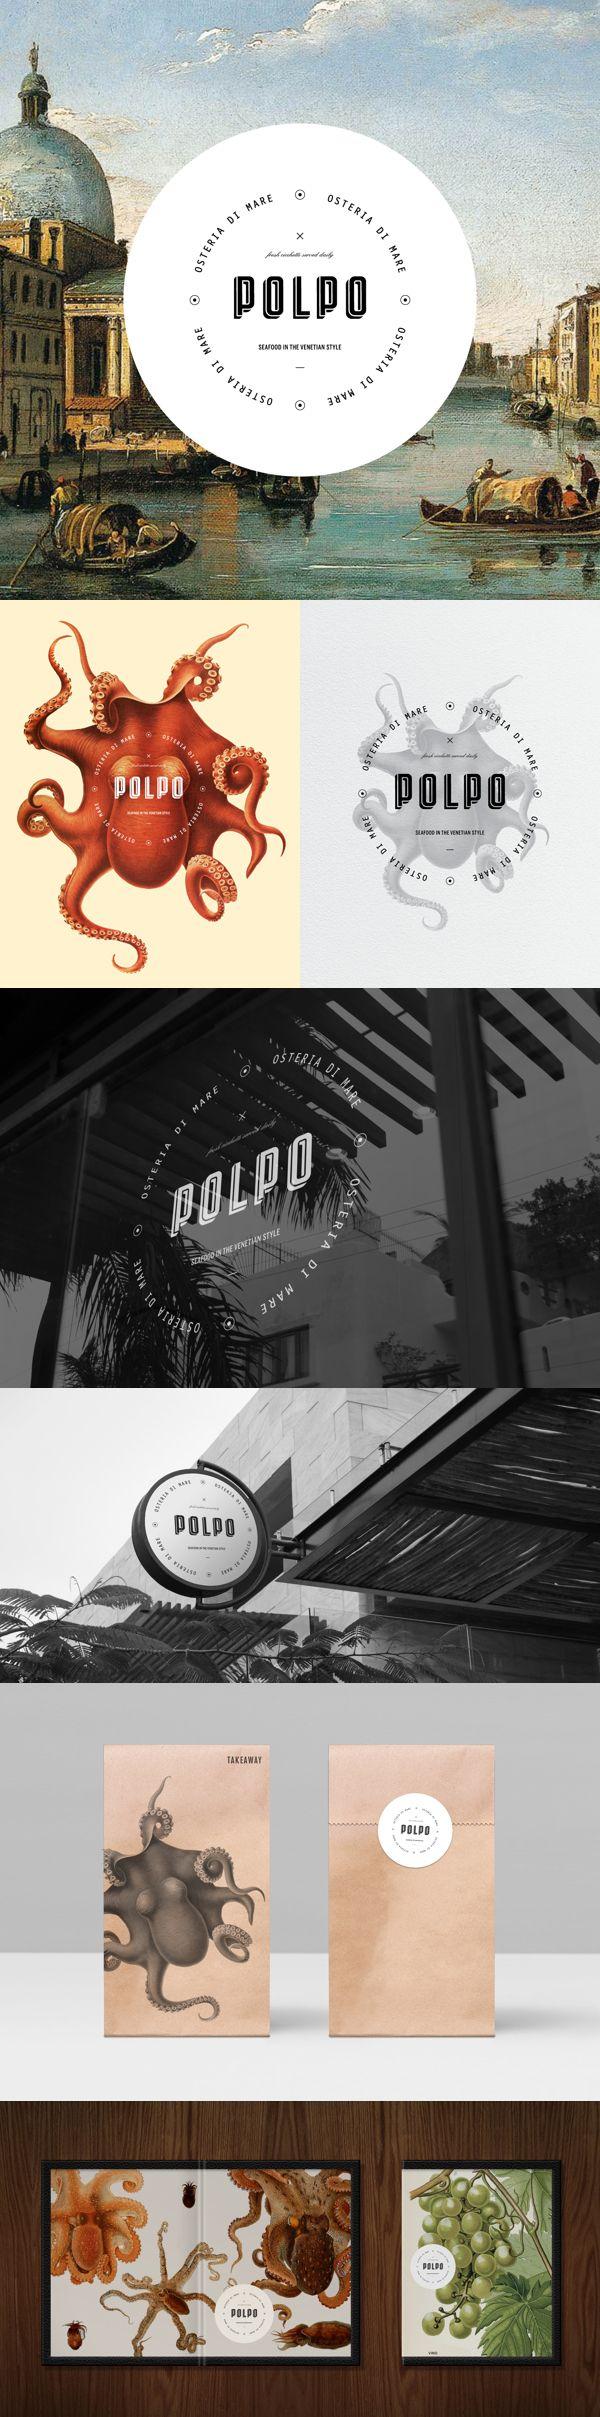 identity / Polpo Restaurant #ResponsiveDesign #Responsive #Design #WebDesign #UI #UX #GUI #Brand #marketing